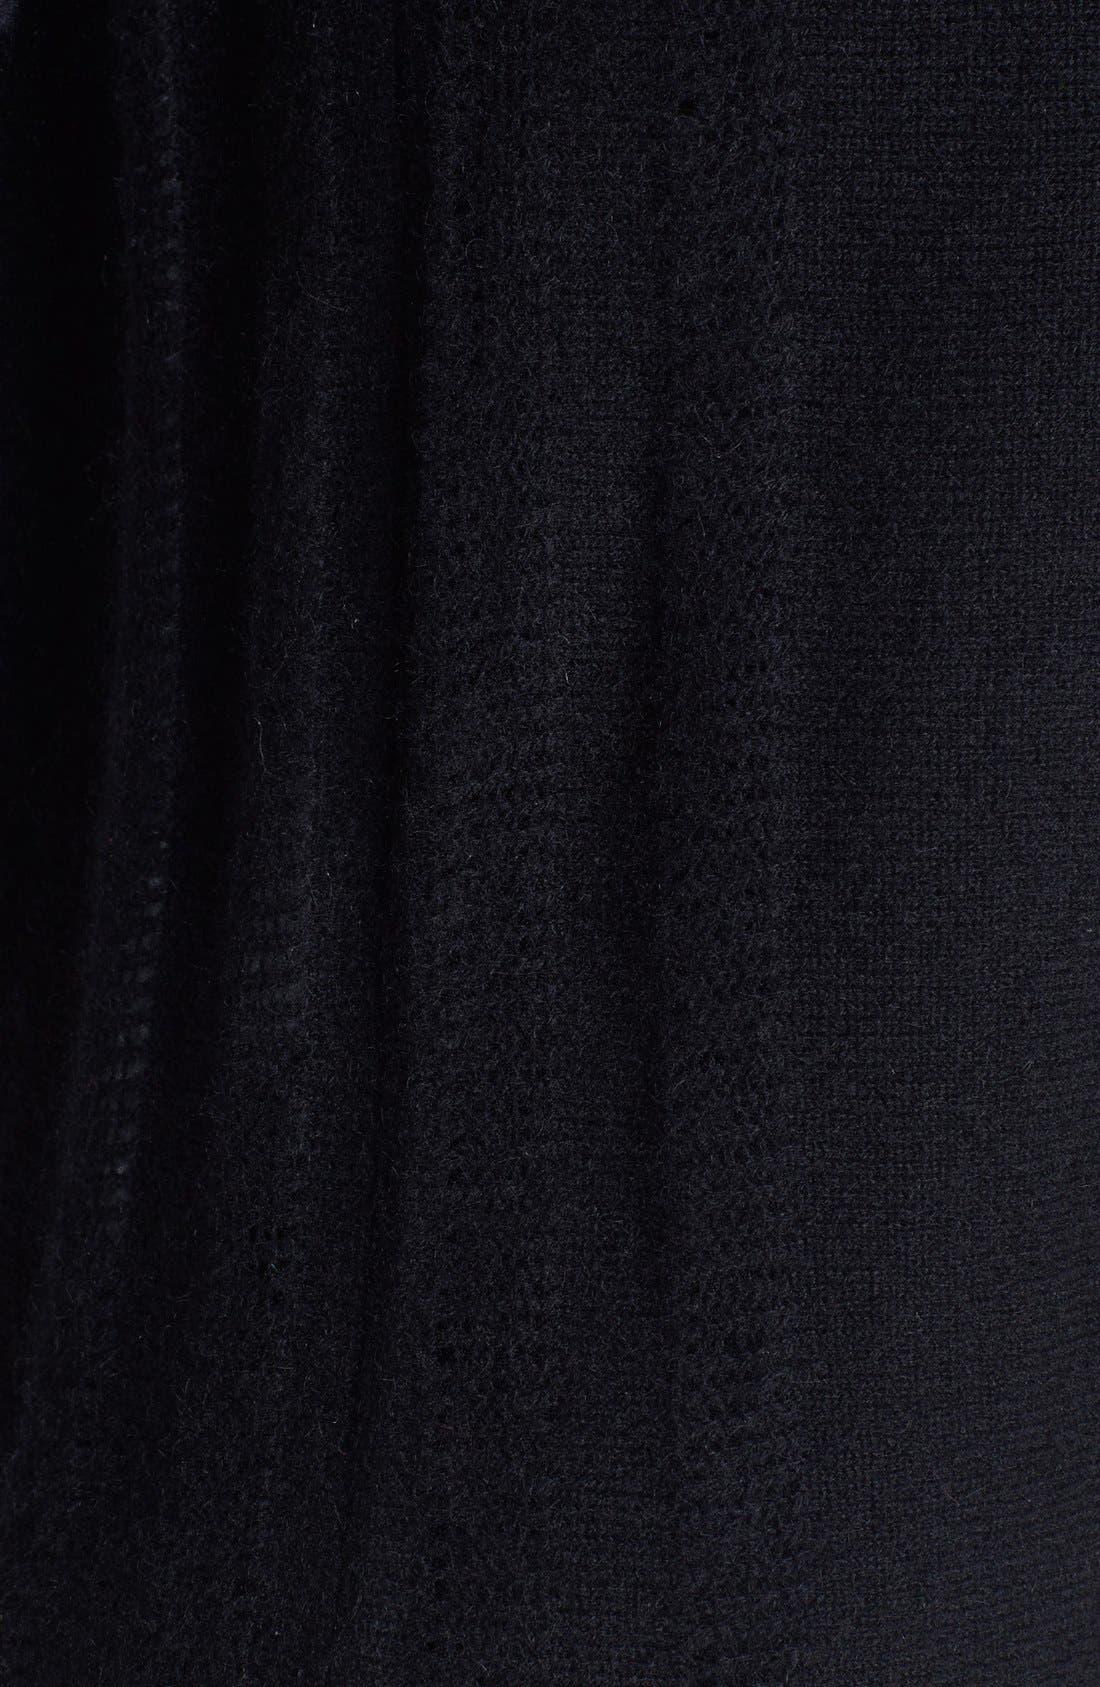 V-Neck Cashmere Sweater,                             Alternate thumbnail 3, color,                             001